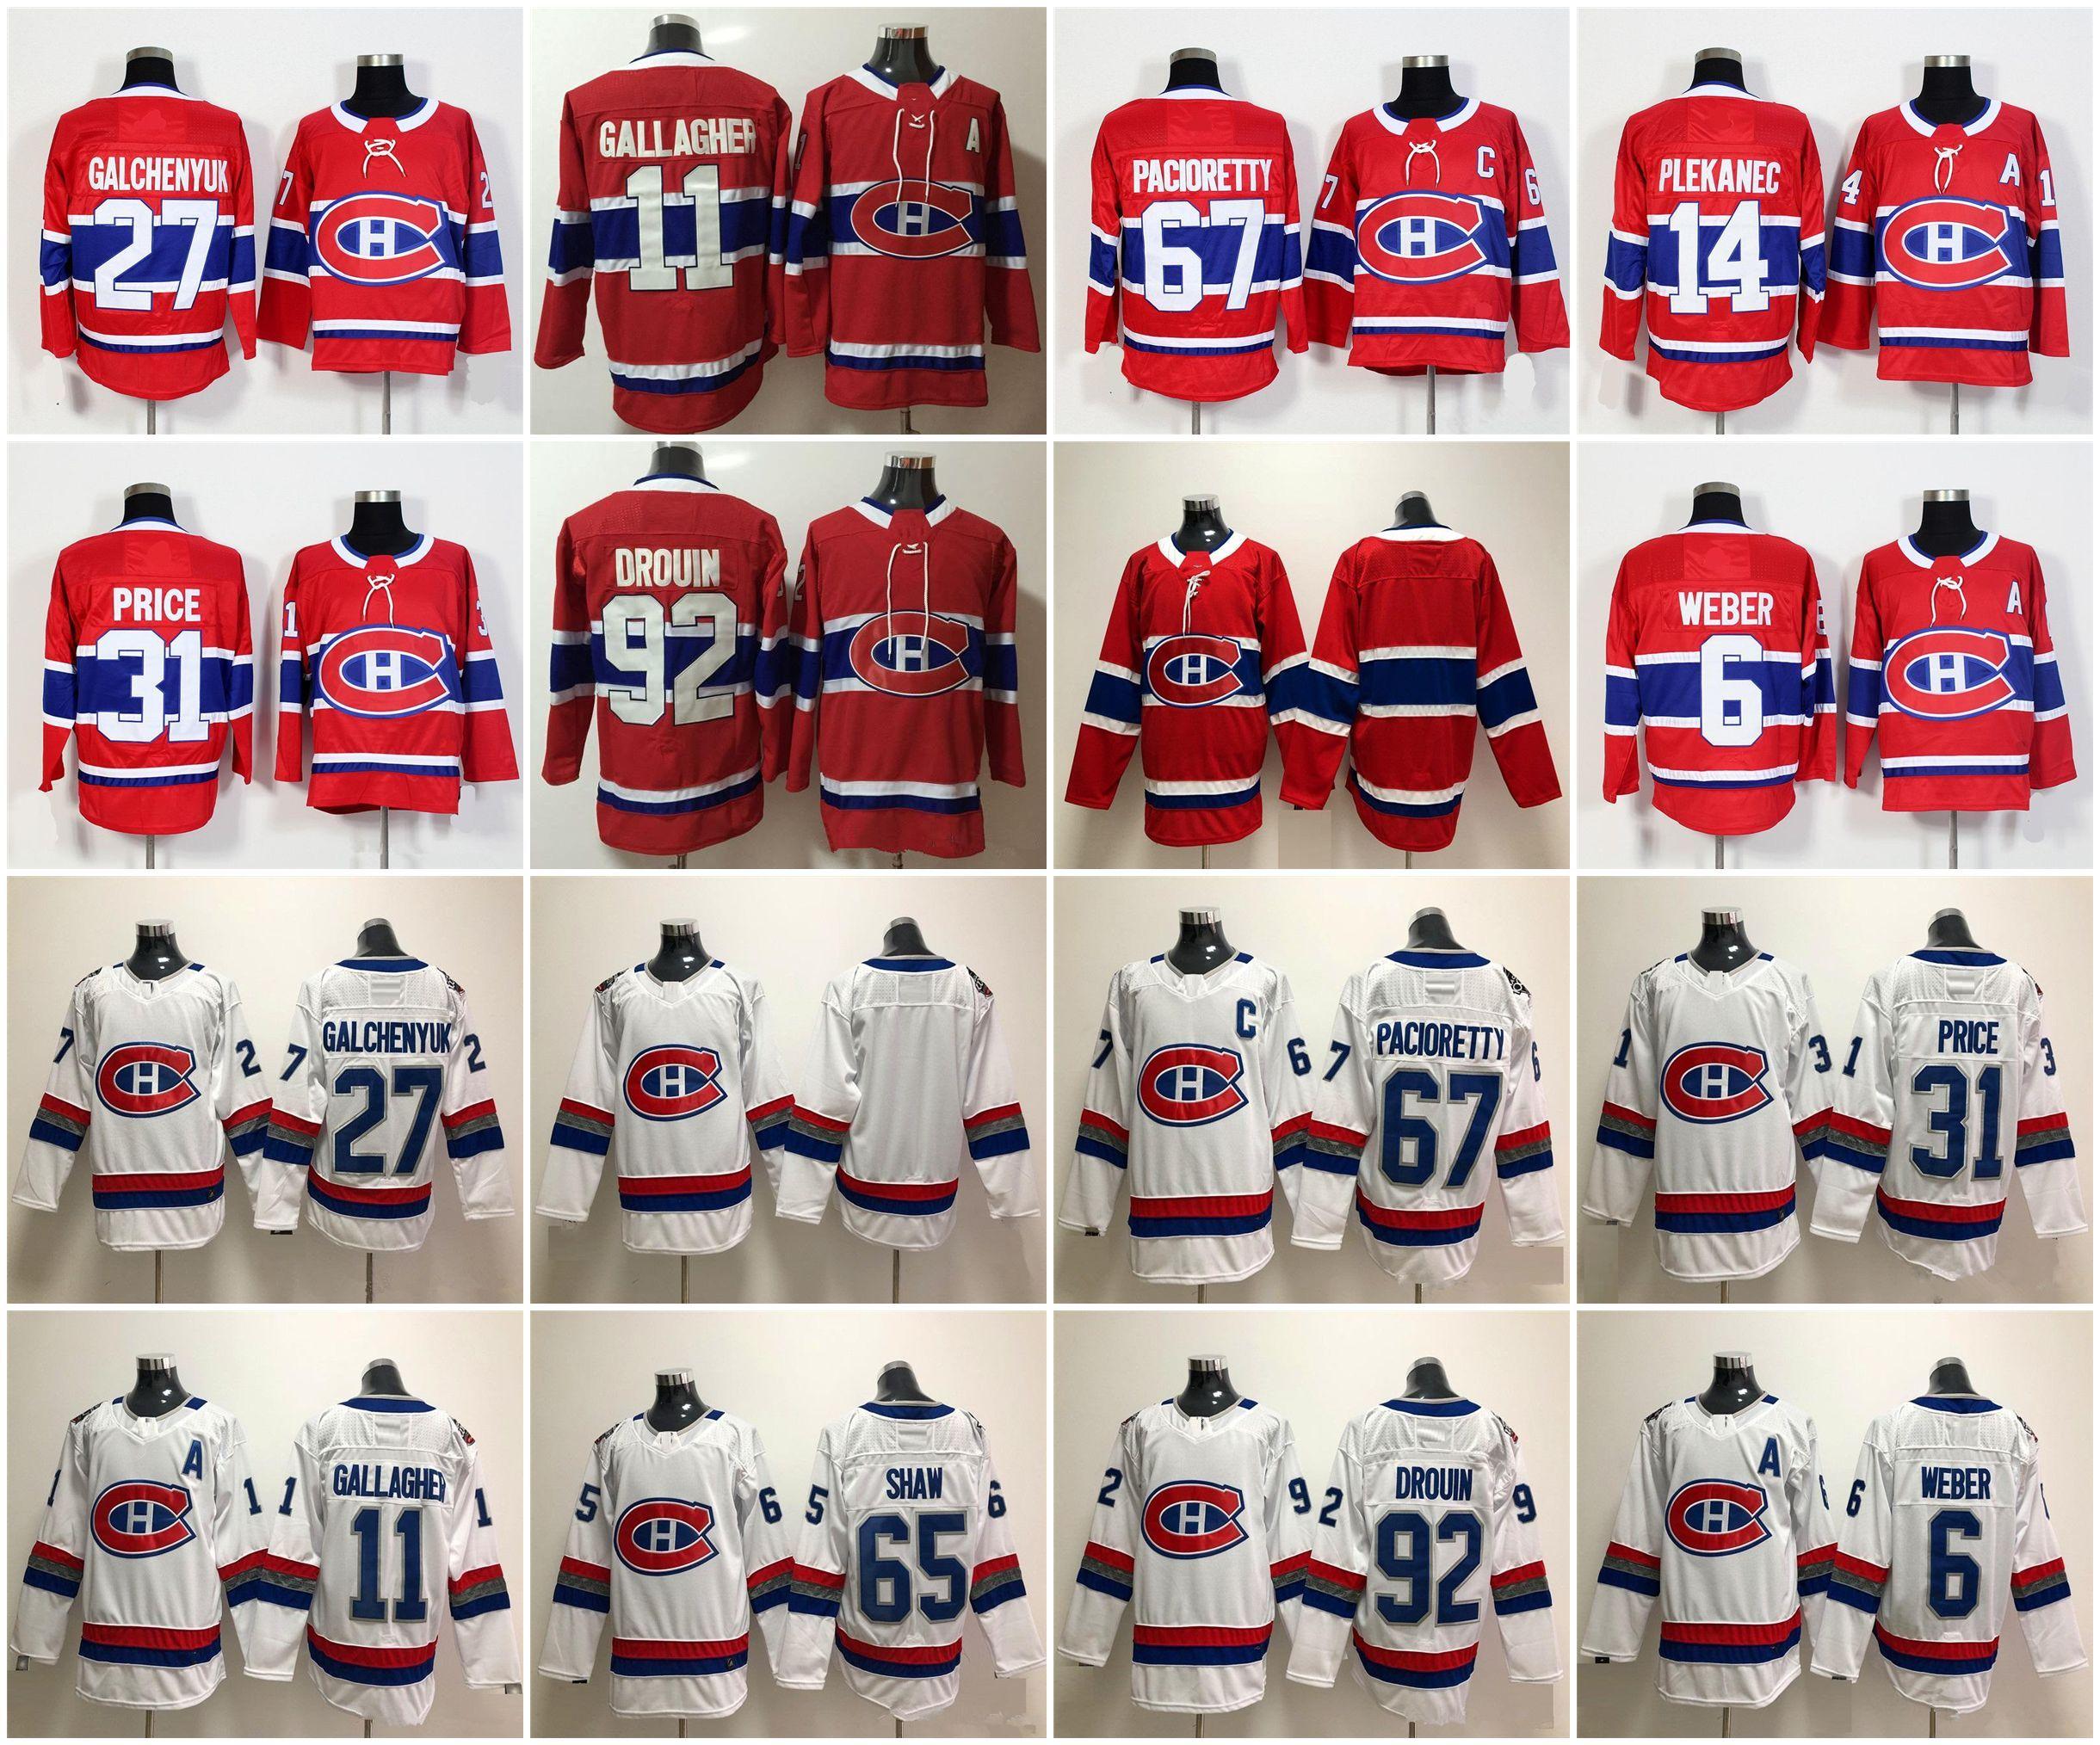 dc8feae11 2018 Montreal Canadiens Carey Price Jonathan Drouin Shea Weber ...